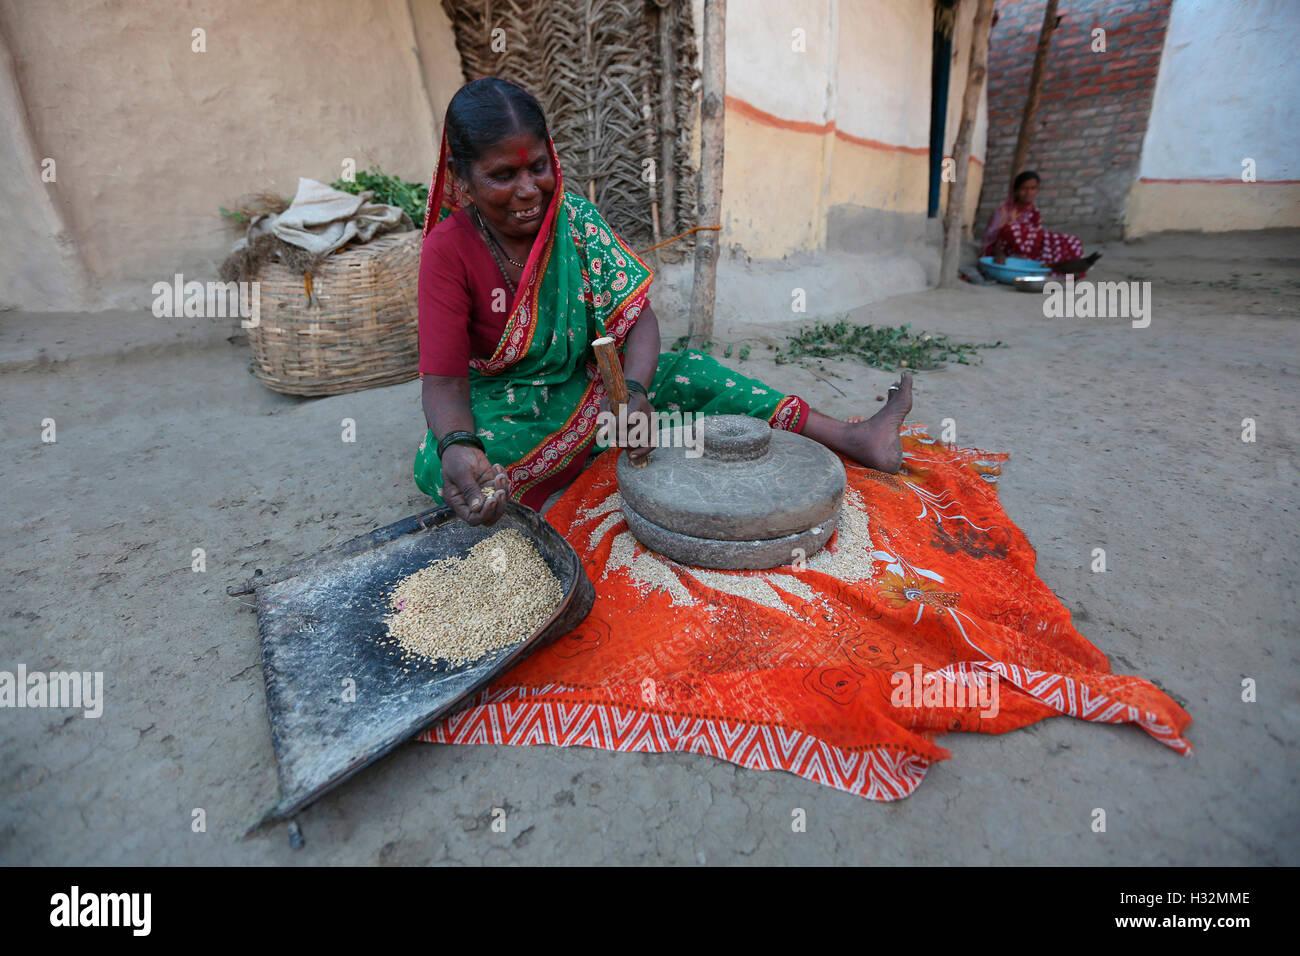 Woman pounding grains. ANDH TRIBE, Injegaon village, Maharashtra, India - Stock Image